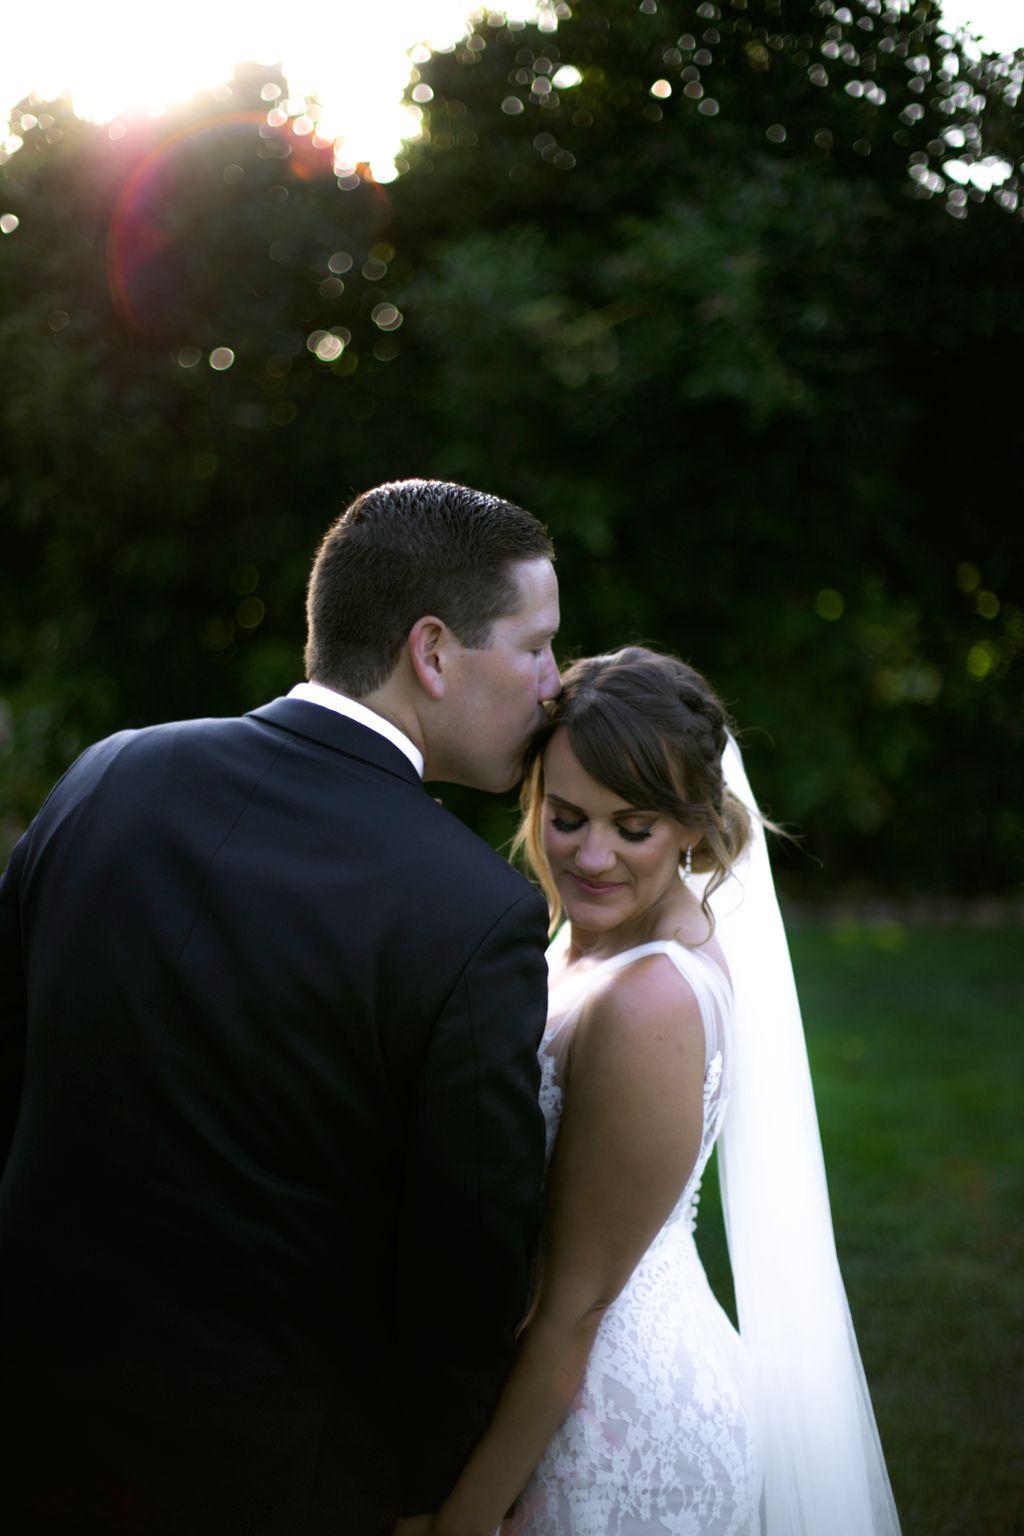 Wedding and Event Videography - Camarillo 2020